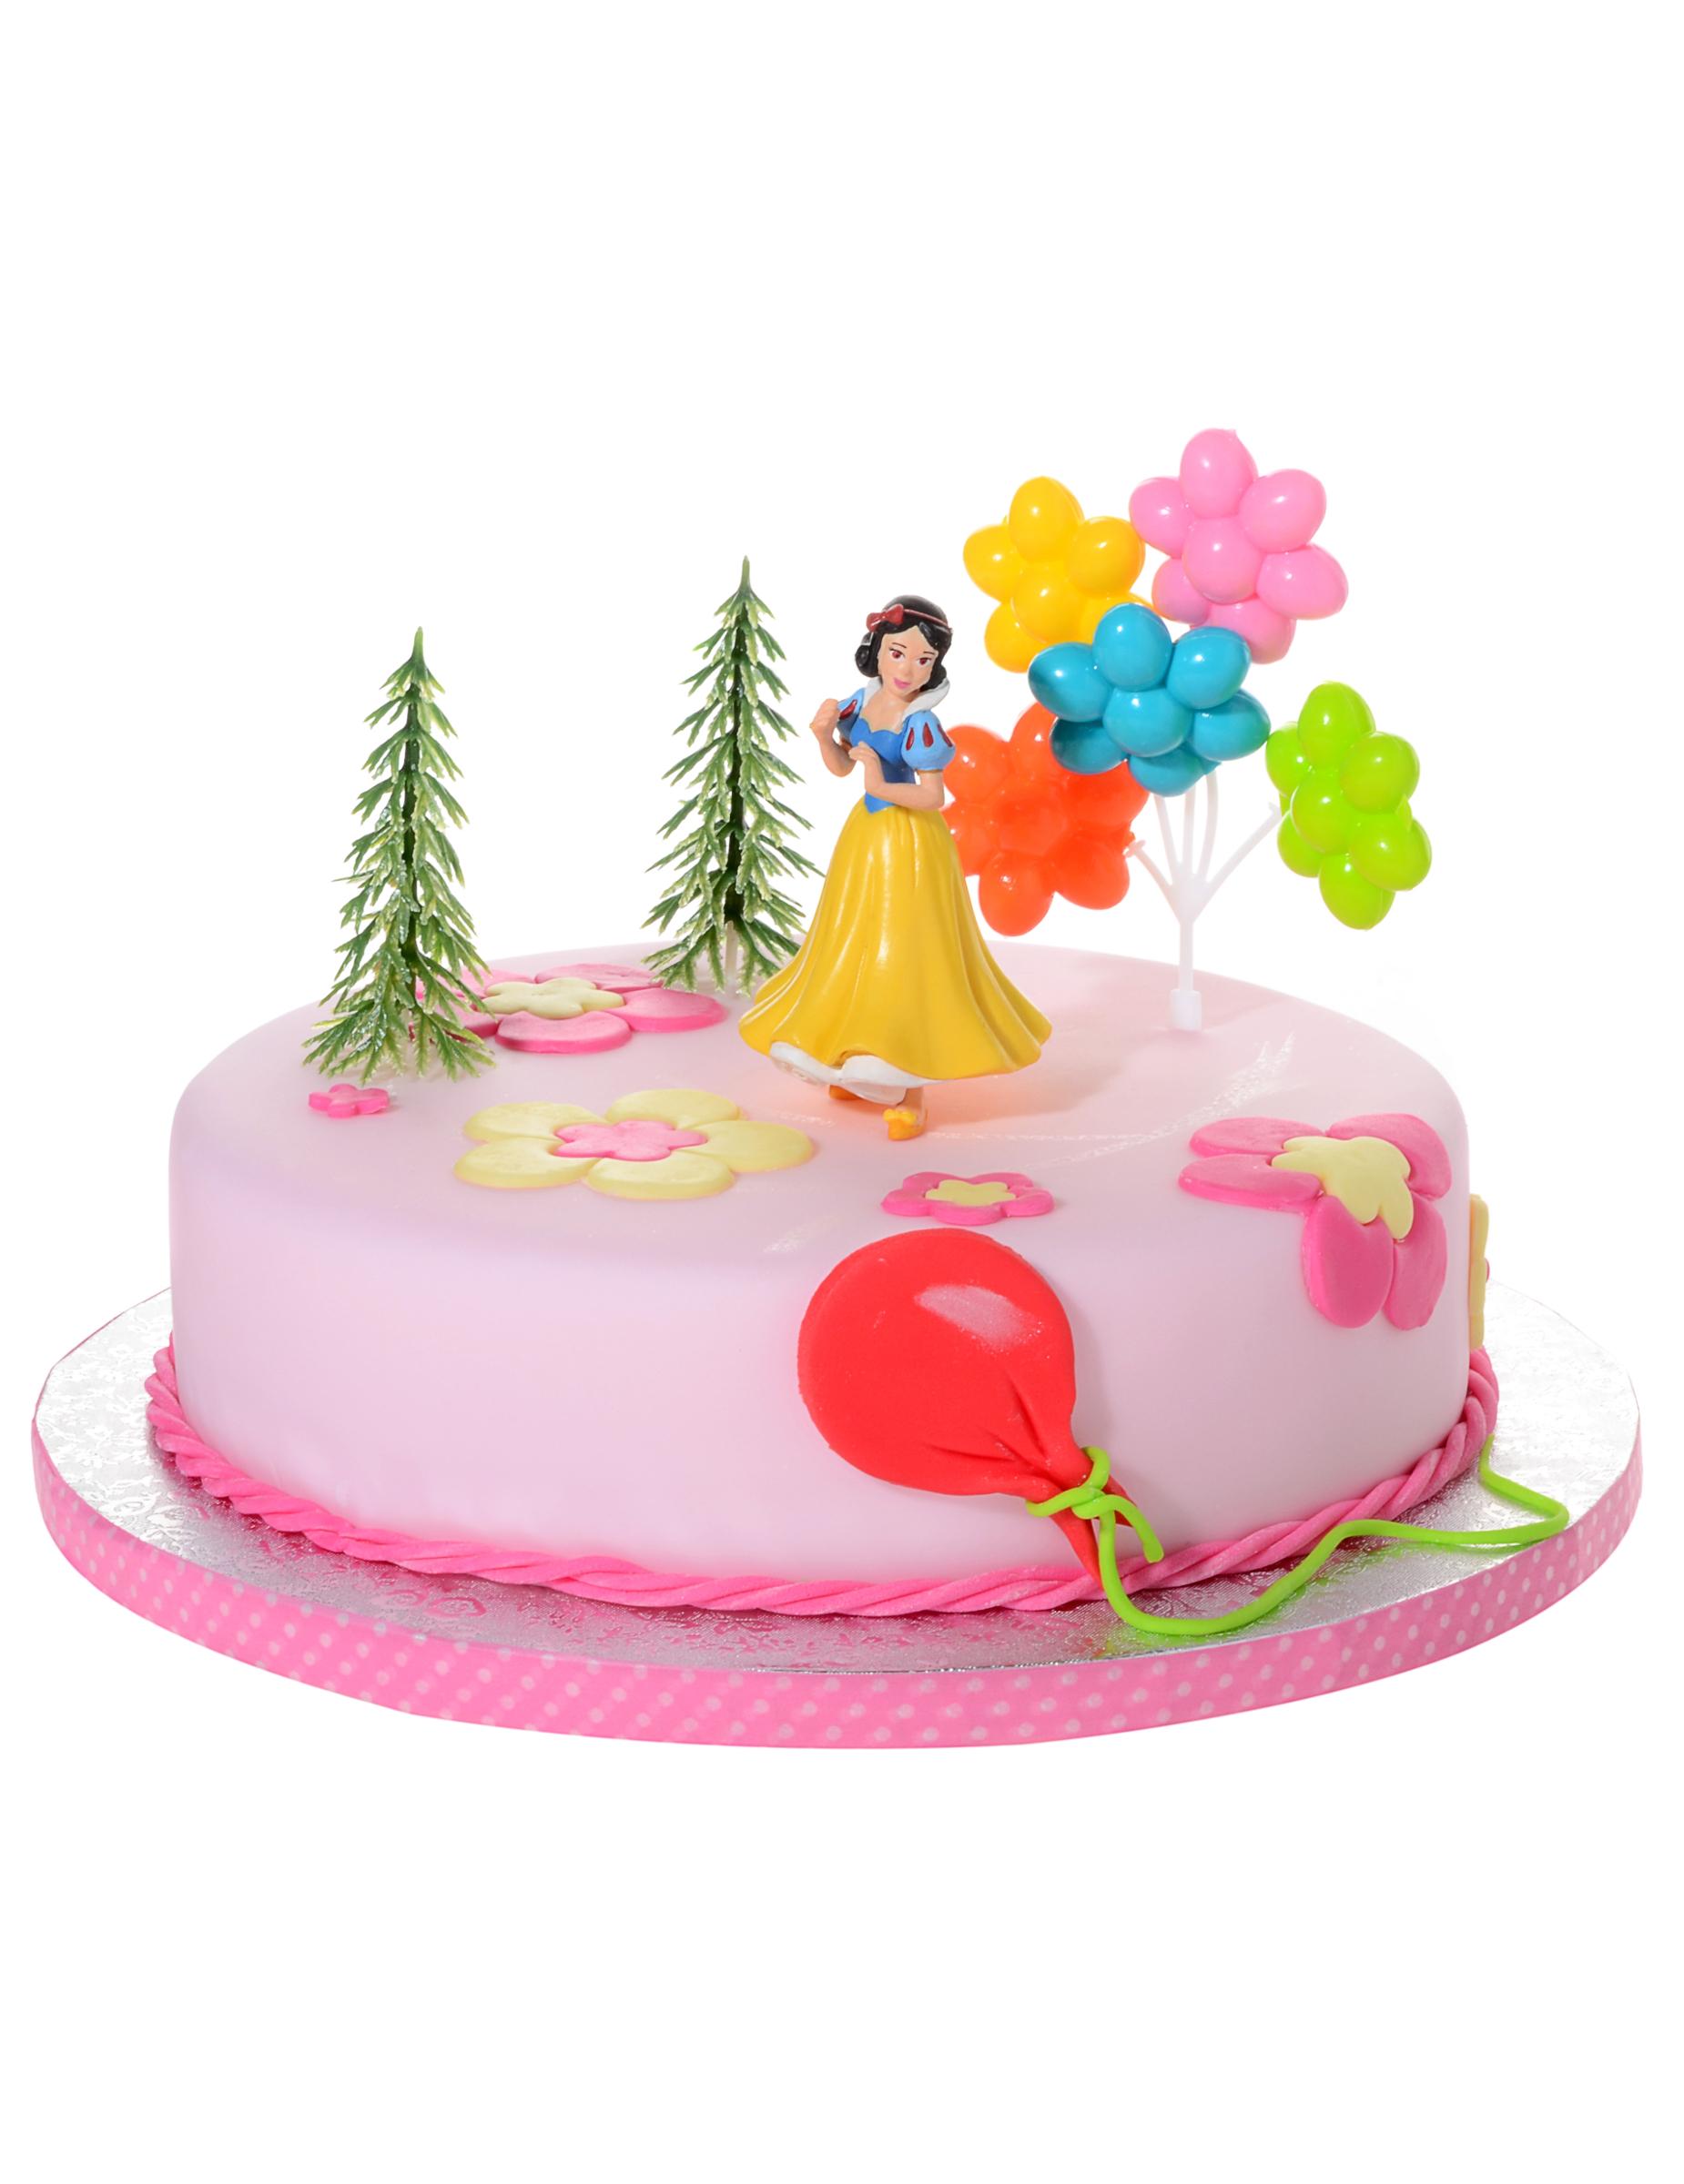 Decorazioni Per Torta Principesse Disney Biancaneve Kit 4